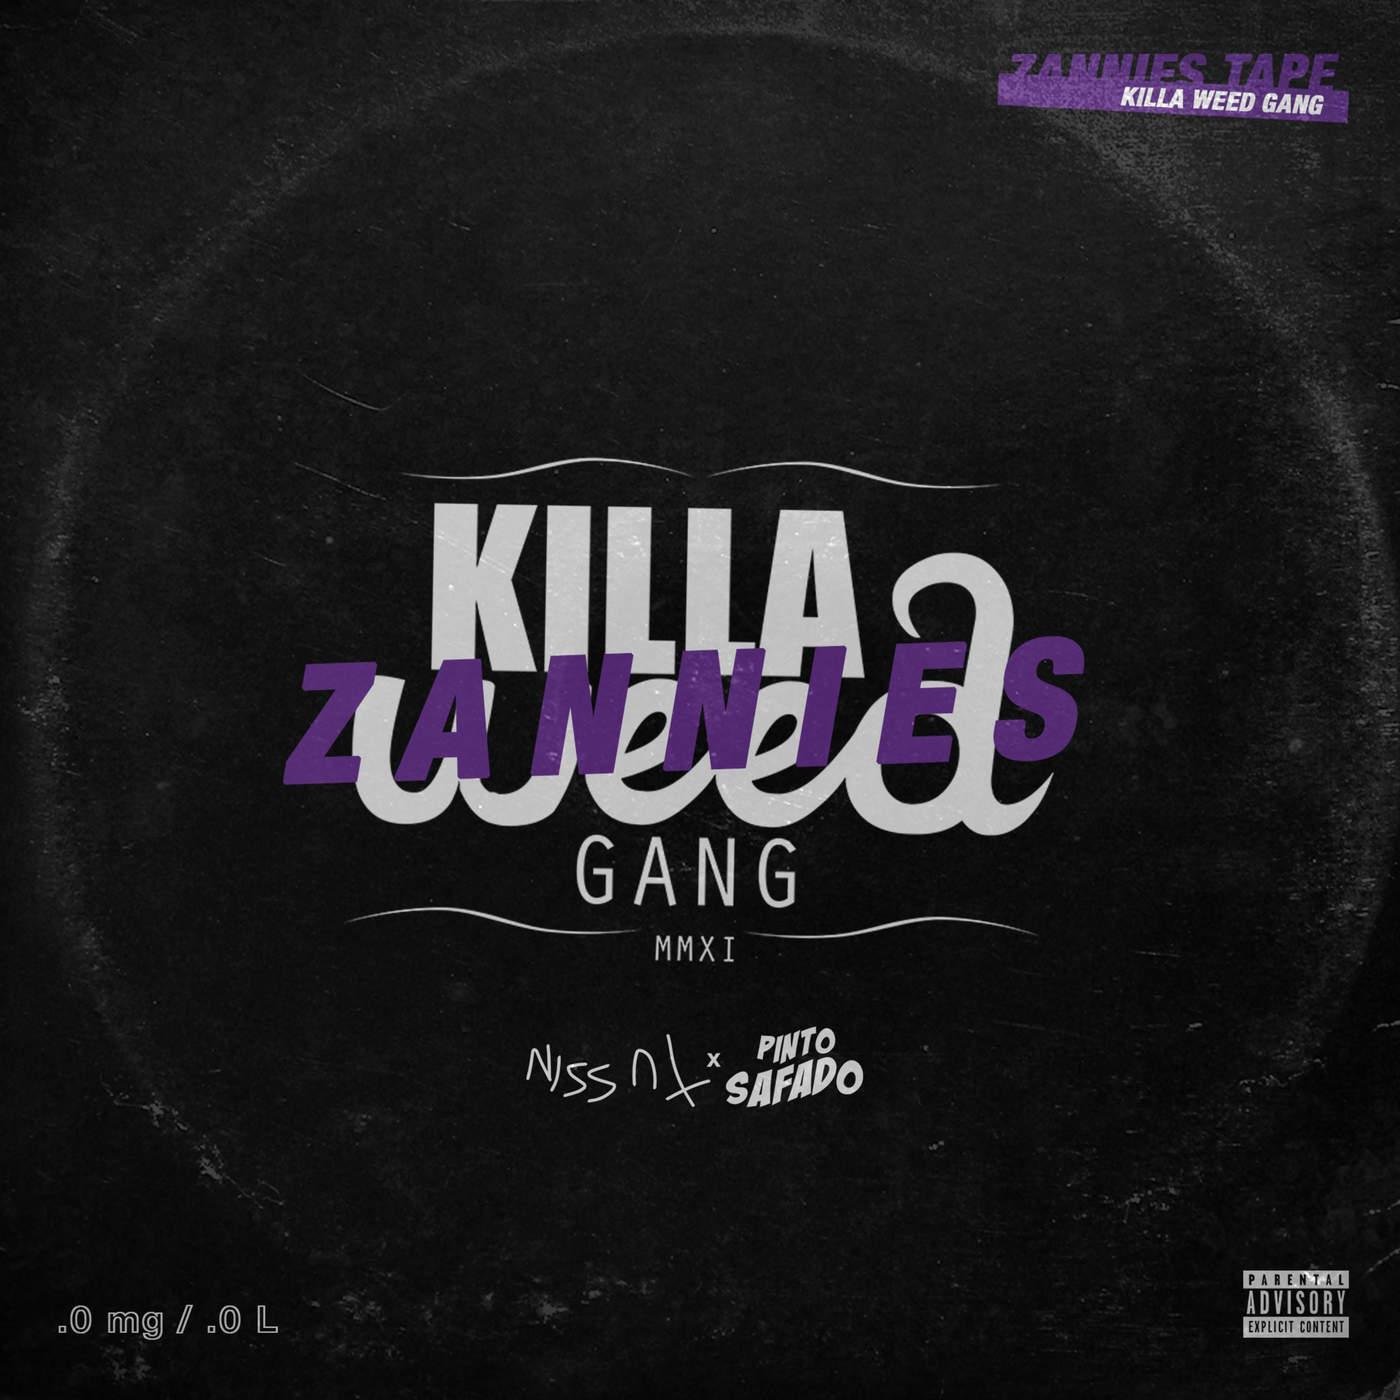 Killa Weed Gang - Zannies